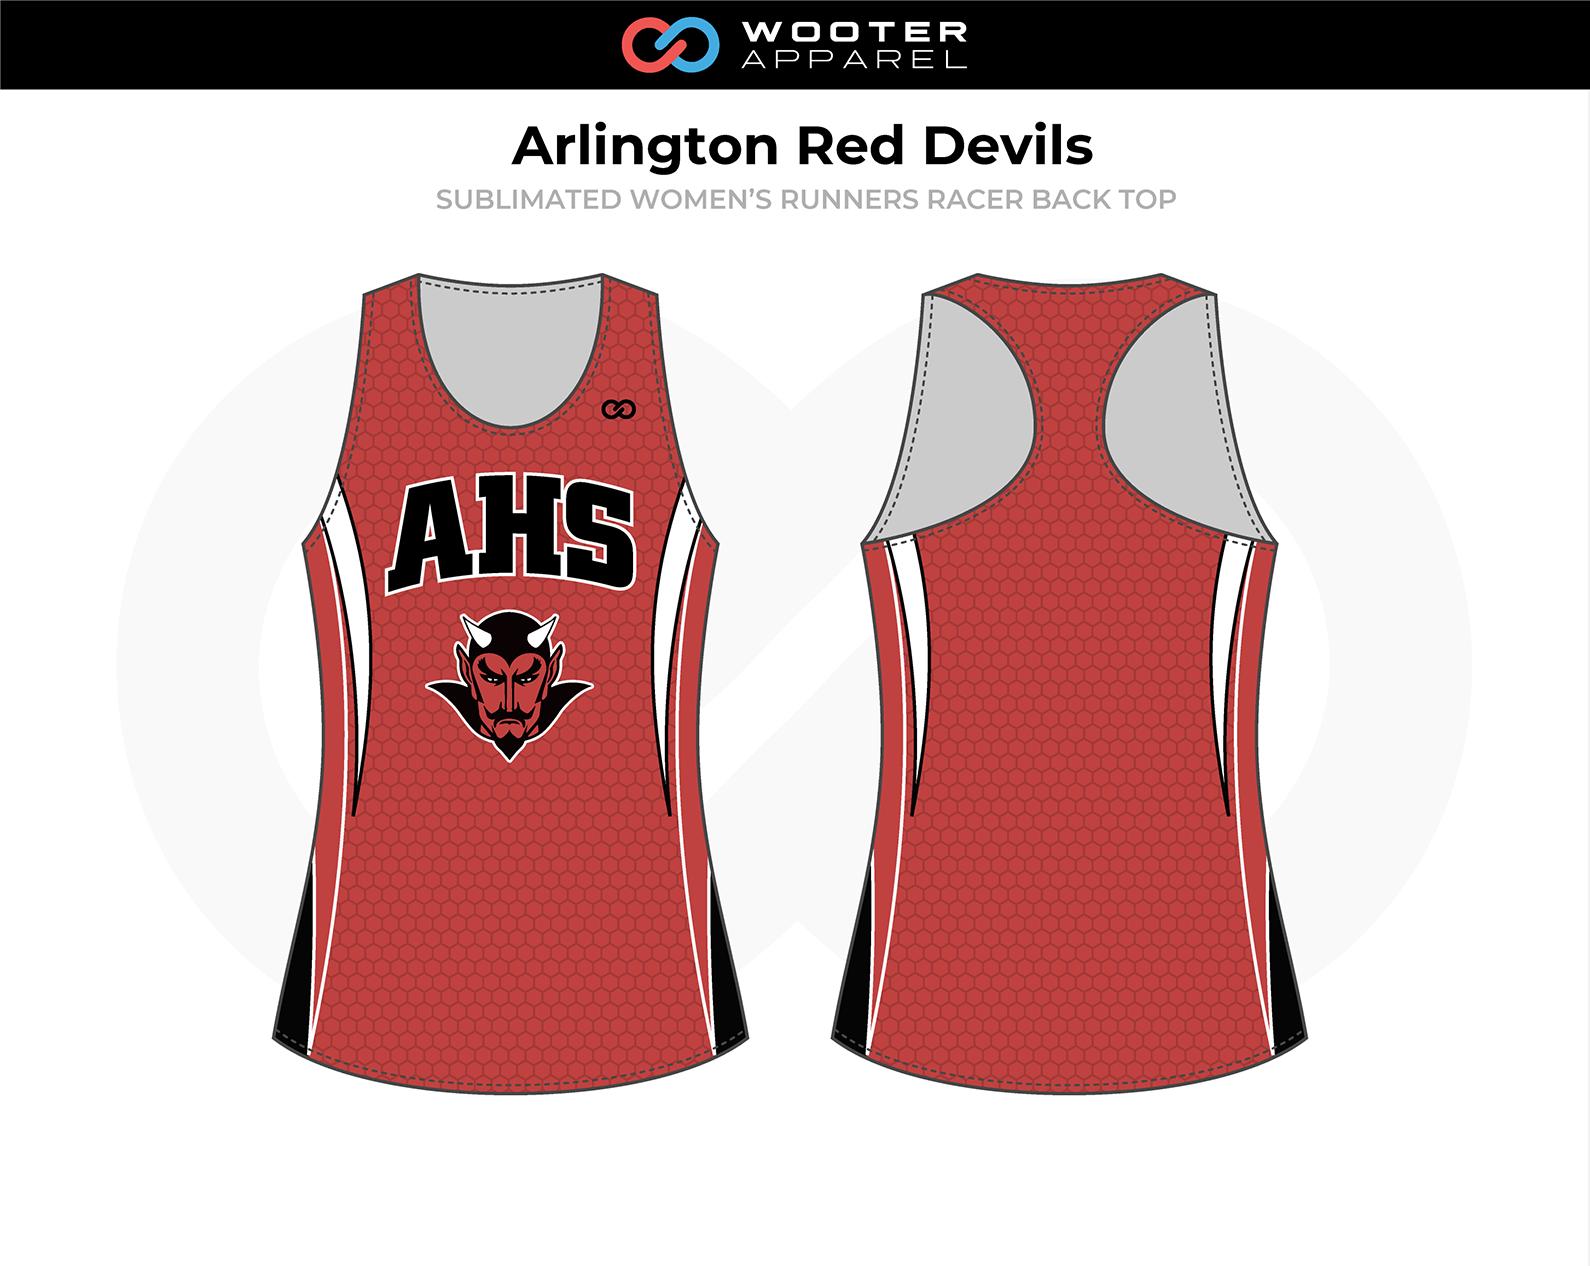 2018-12-17 Arlington Red Devils Running Top (B).png